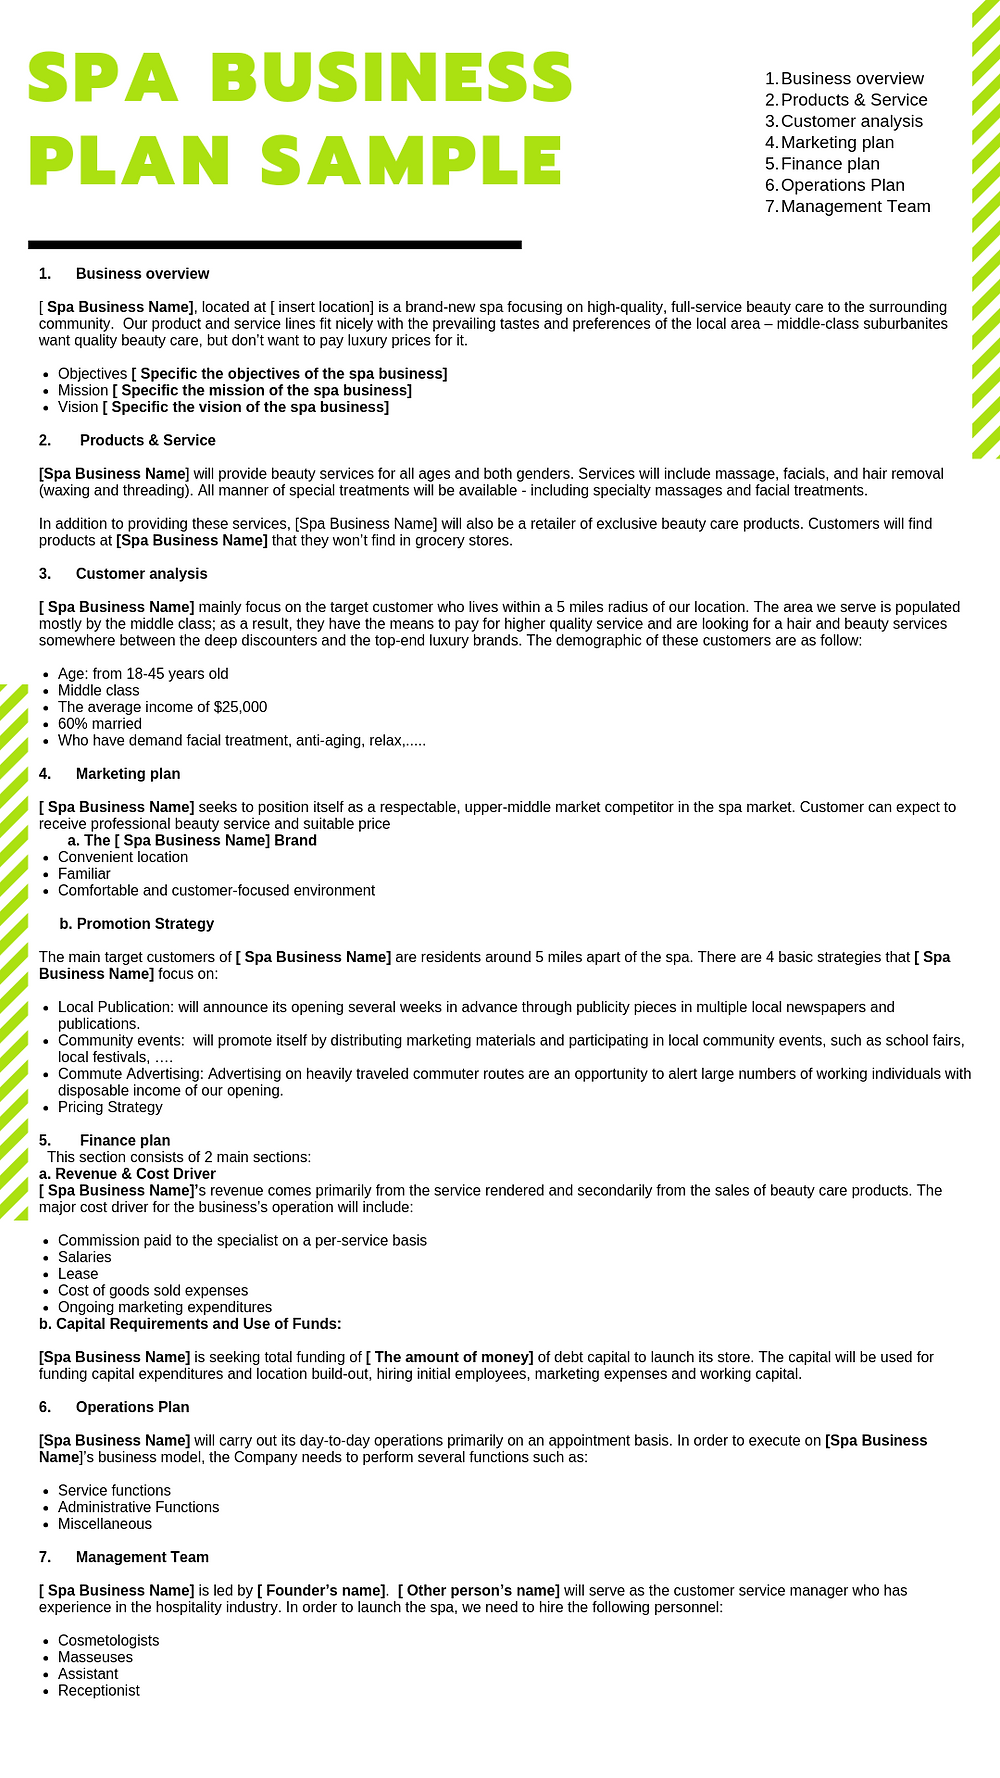 spa business plan sample